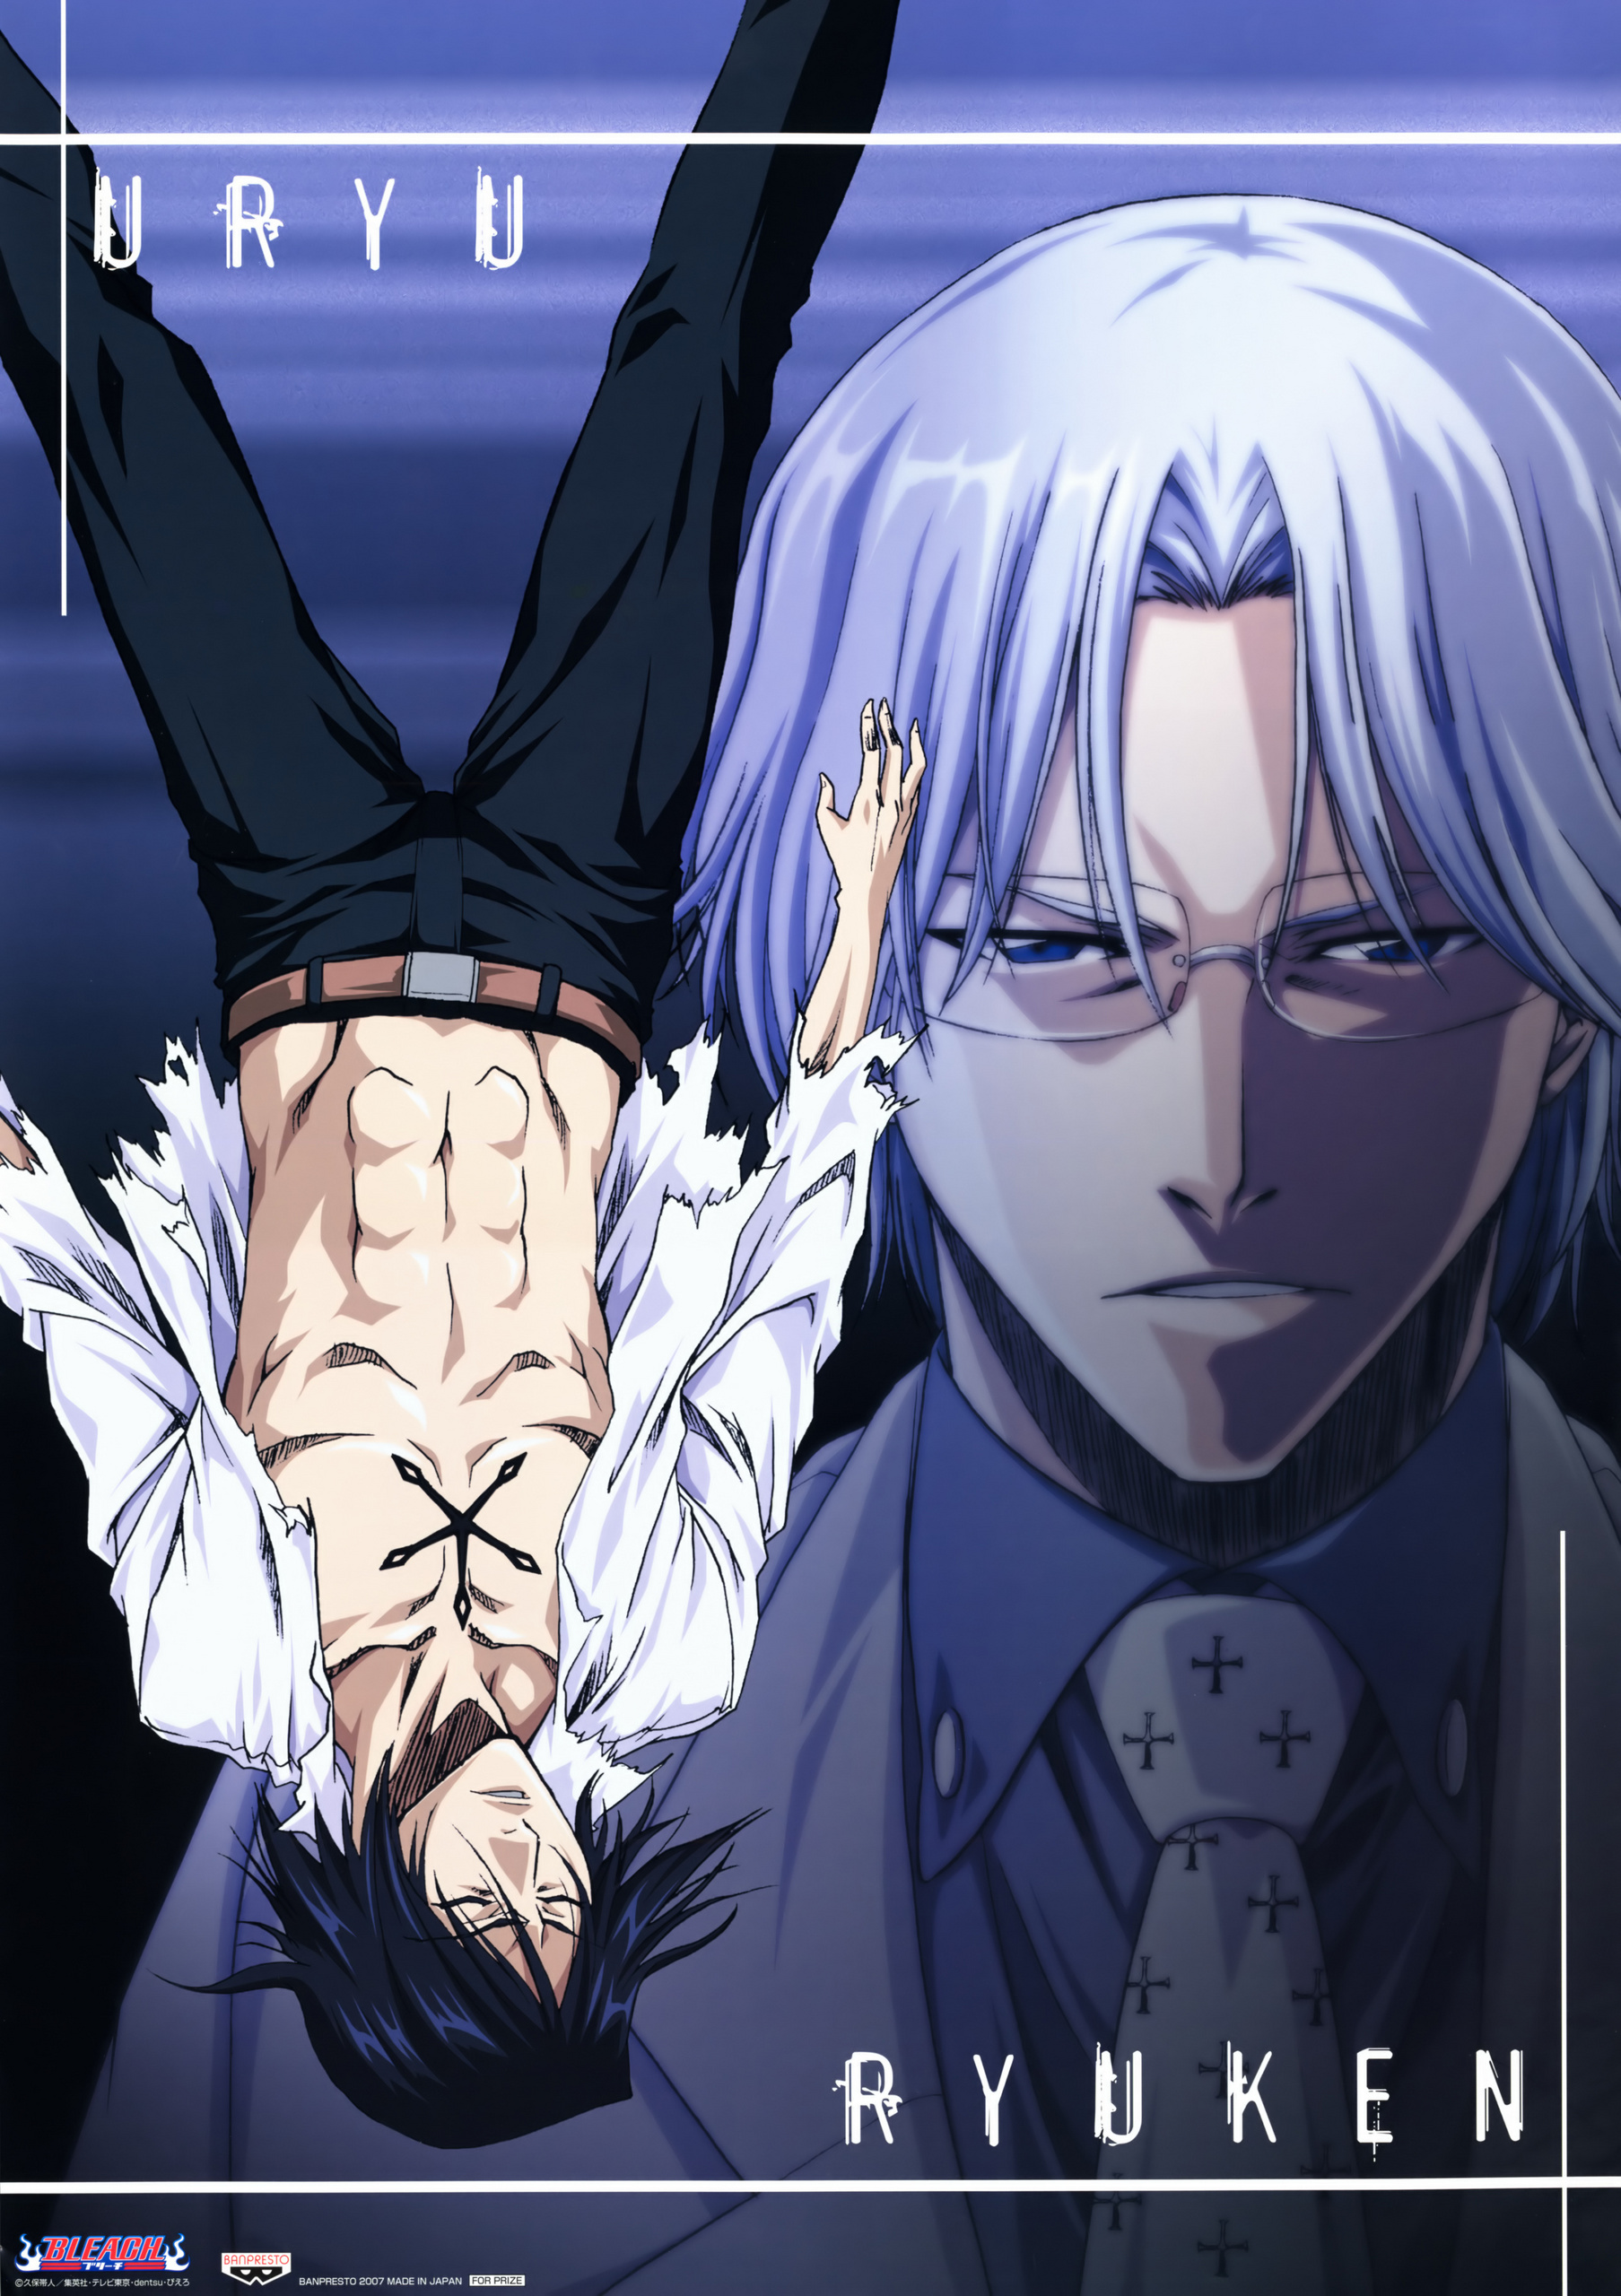 Uryu and Ryuken